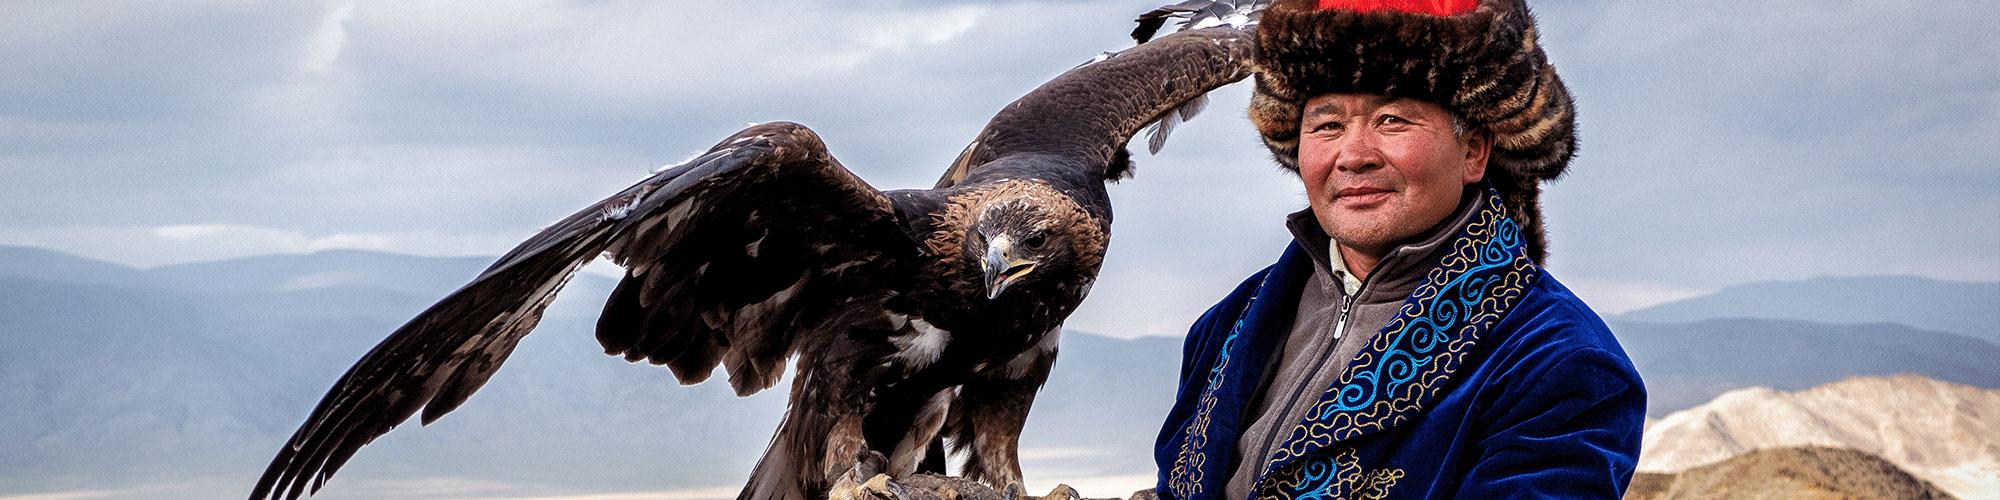 Mongolia, tesoros naturales y culturales - EL PAIS Viajes